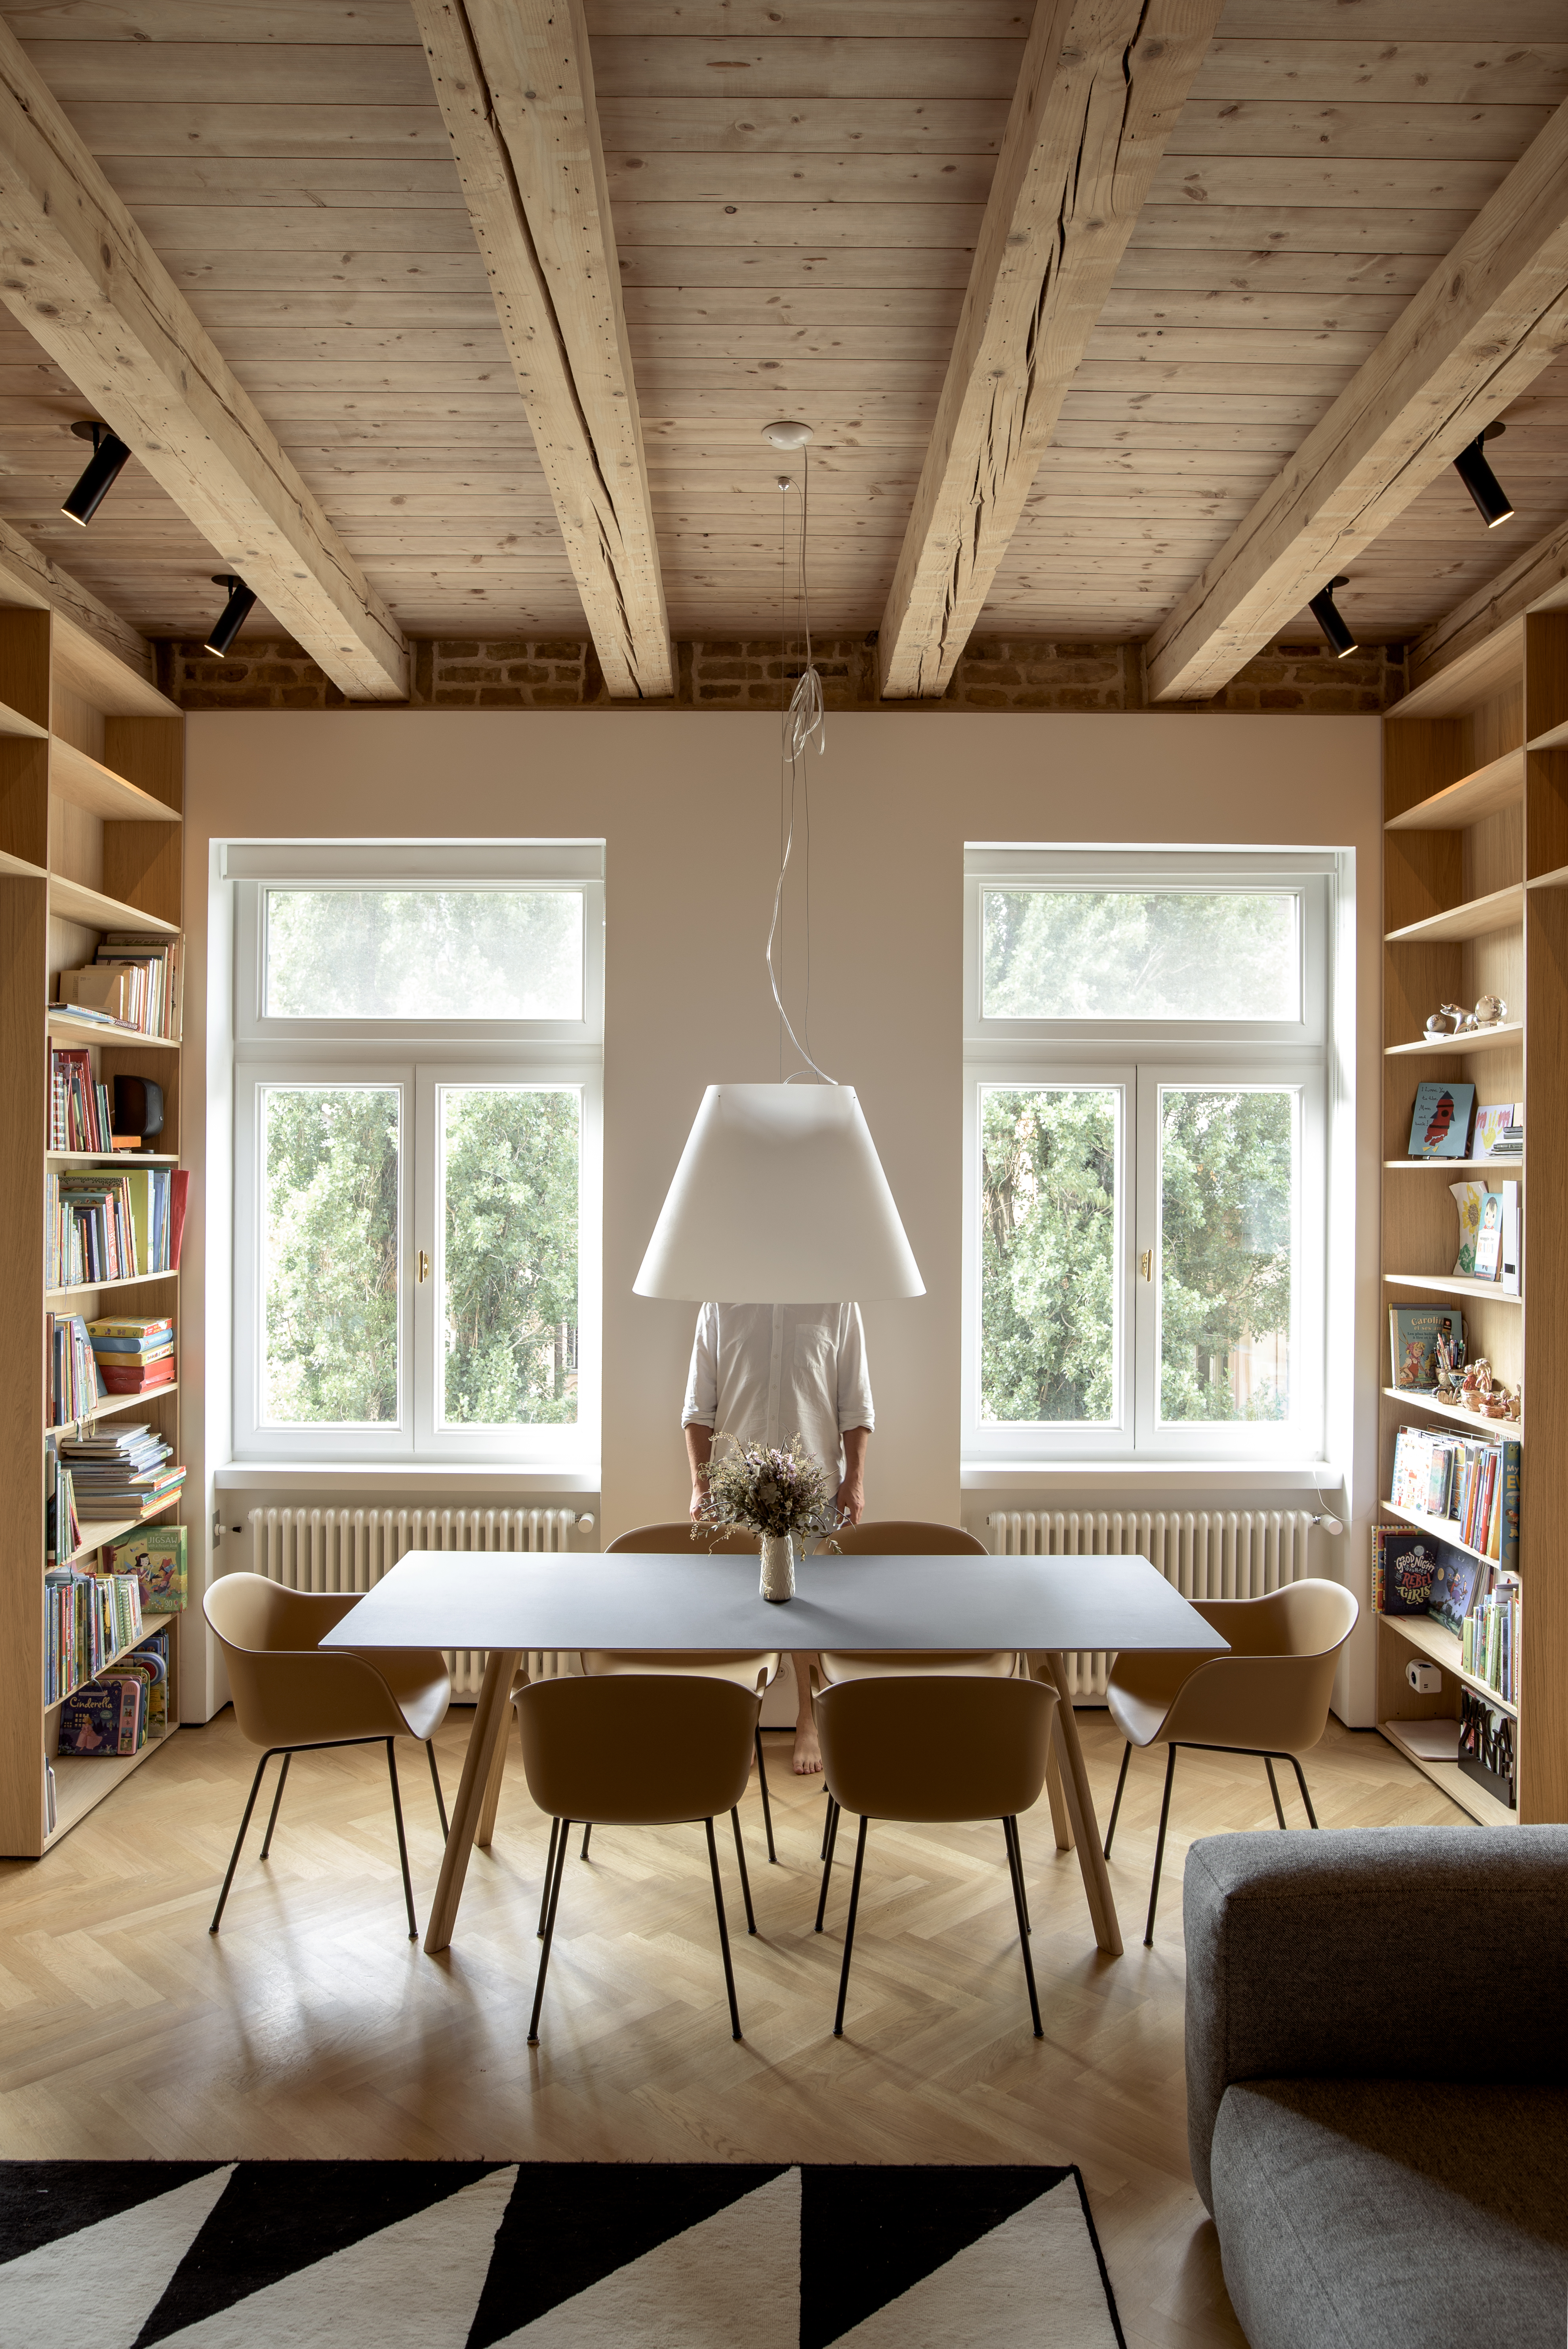 Architectural photography for Martin Skocek